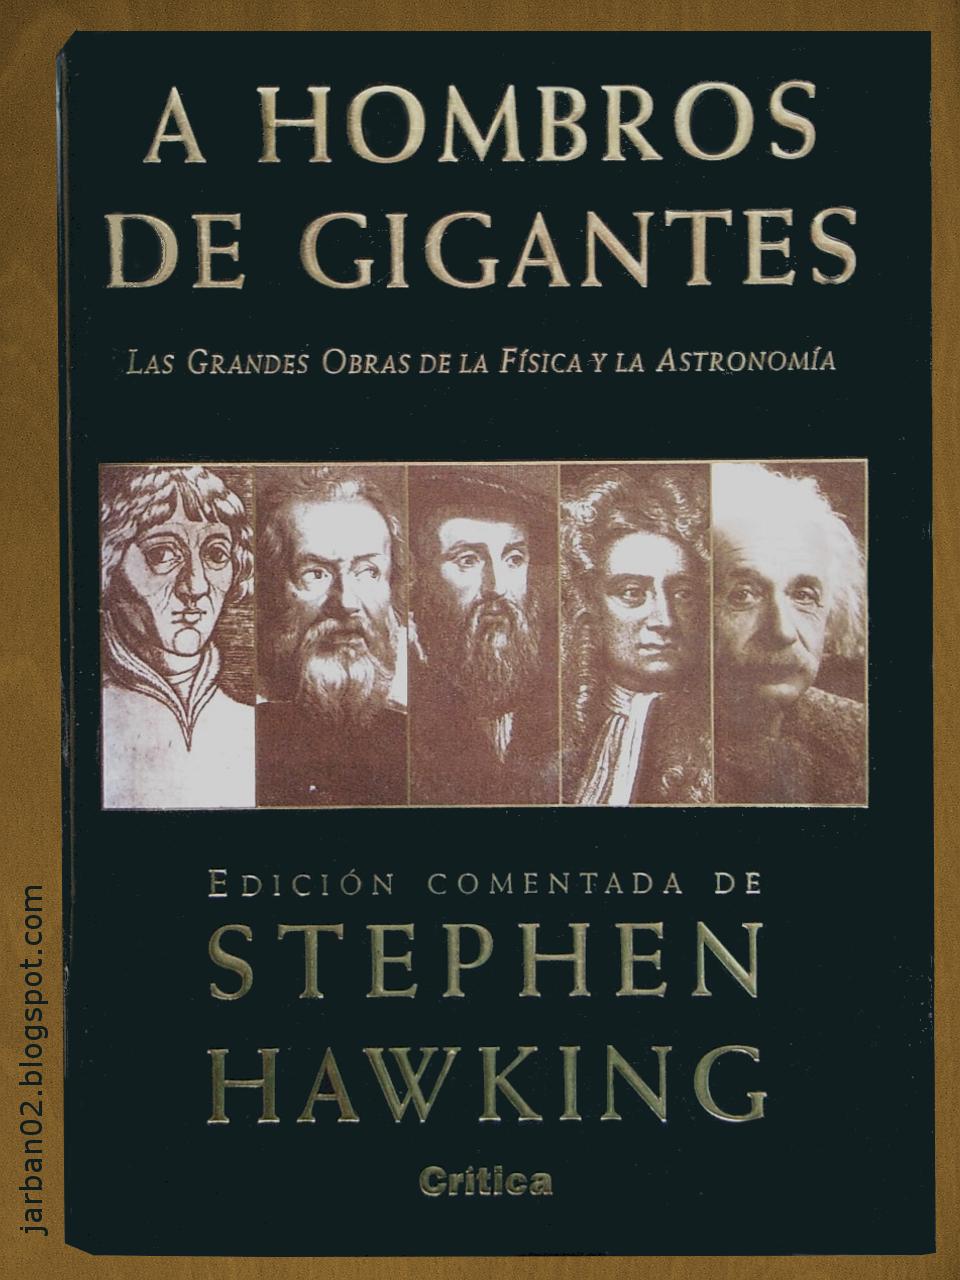 jarban02_pic056: A hombros de gigantes de Stephen Hawking